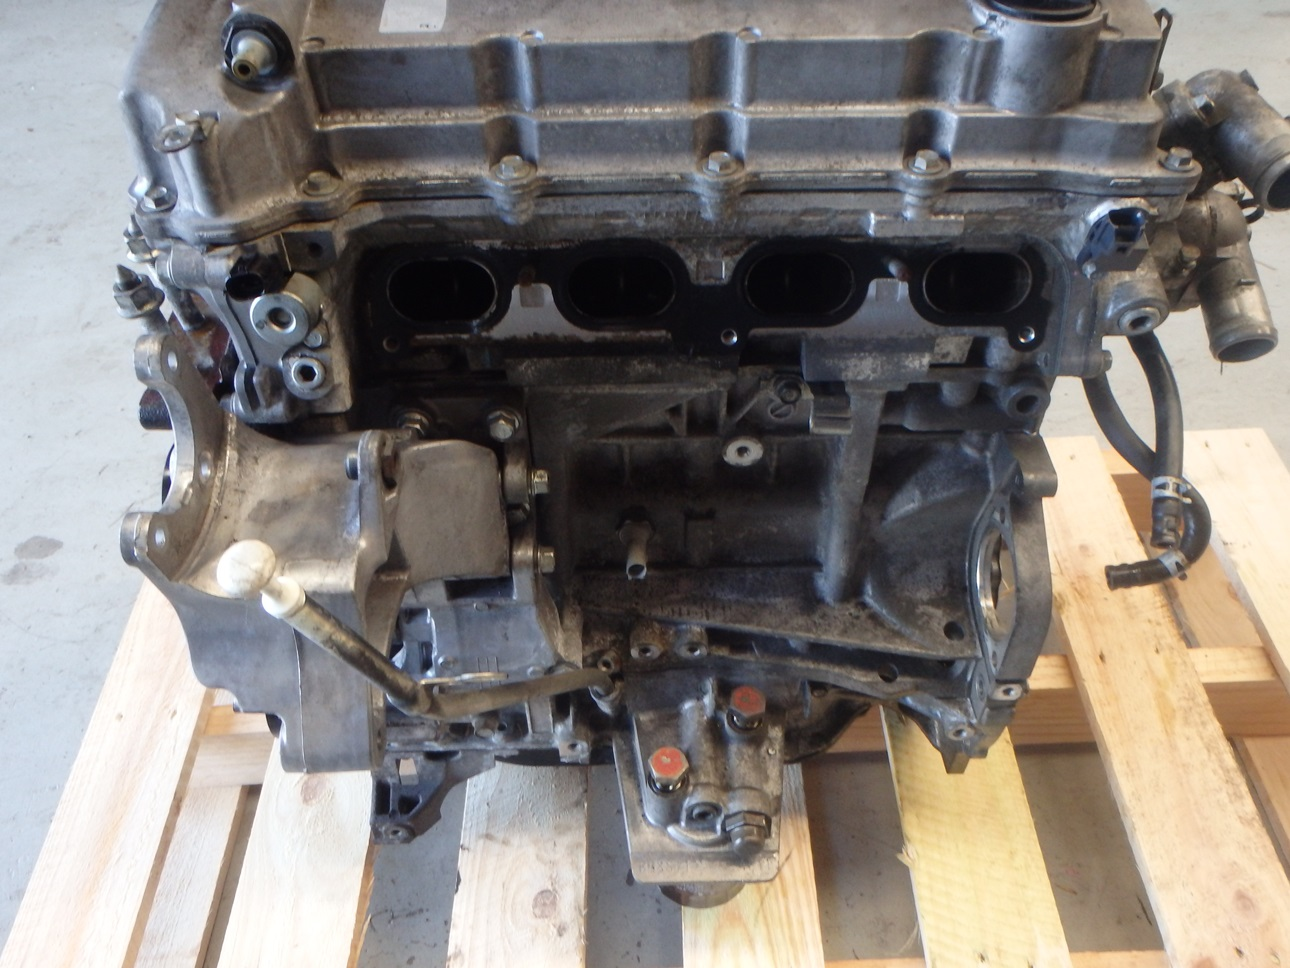 Mitsubishi Lancer Evo X 10 Cz4a 4b11 Turbo Long Engine Motor 2008 Starter Location About Us